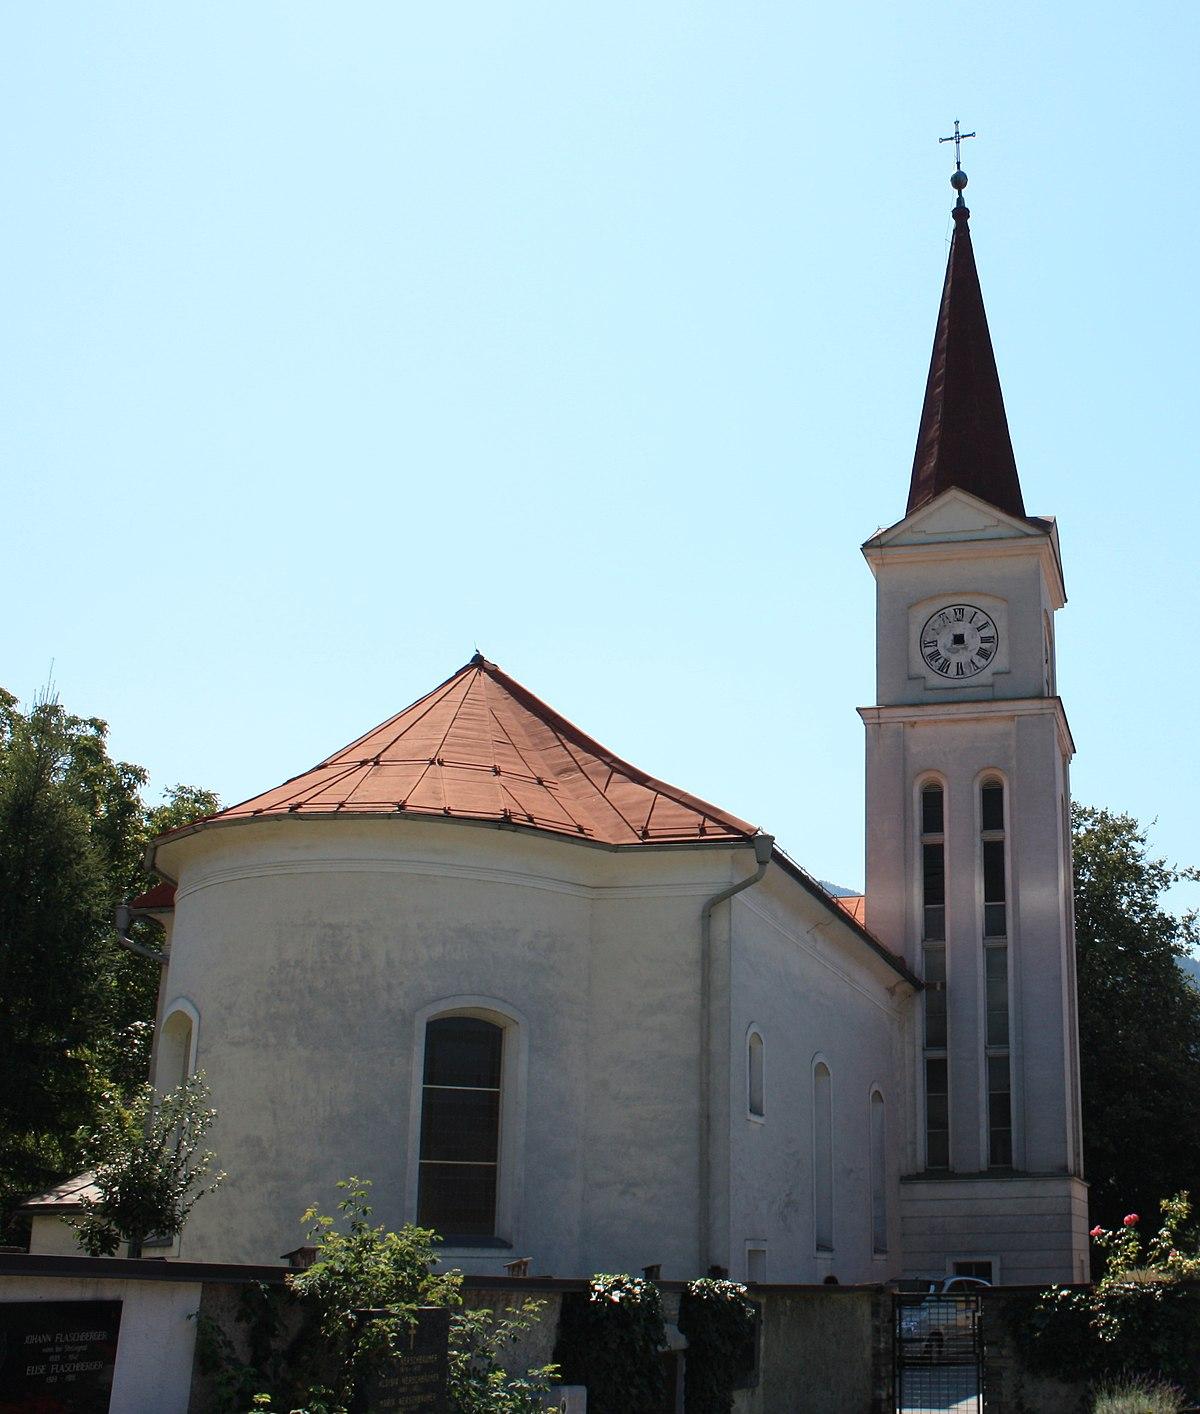 Feffernitz